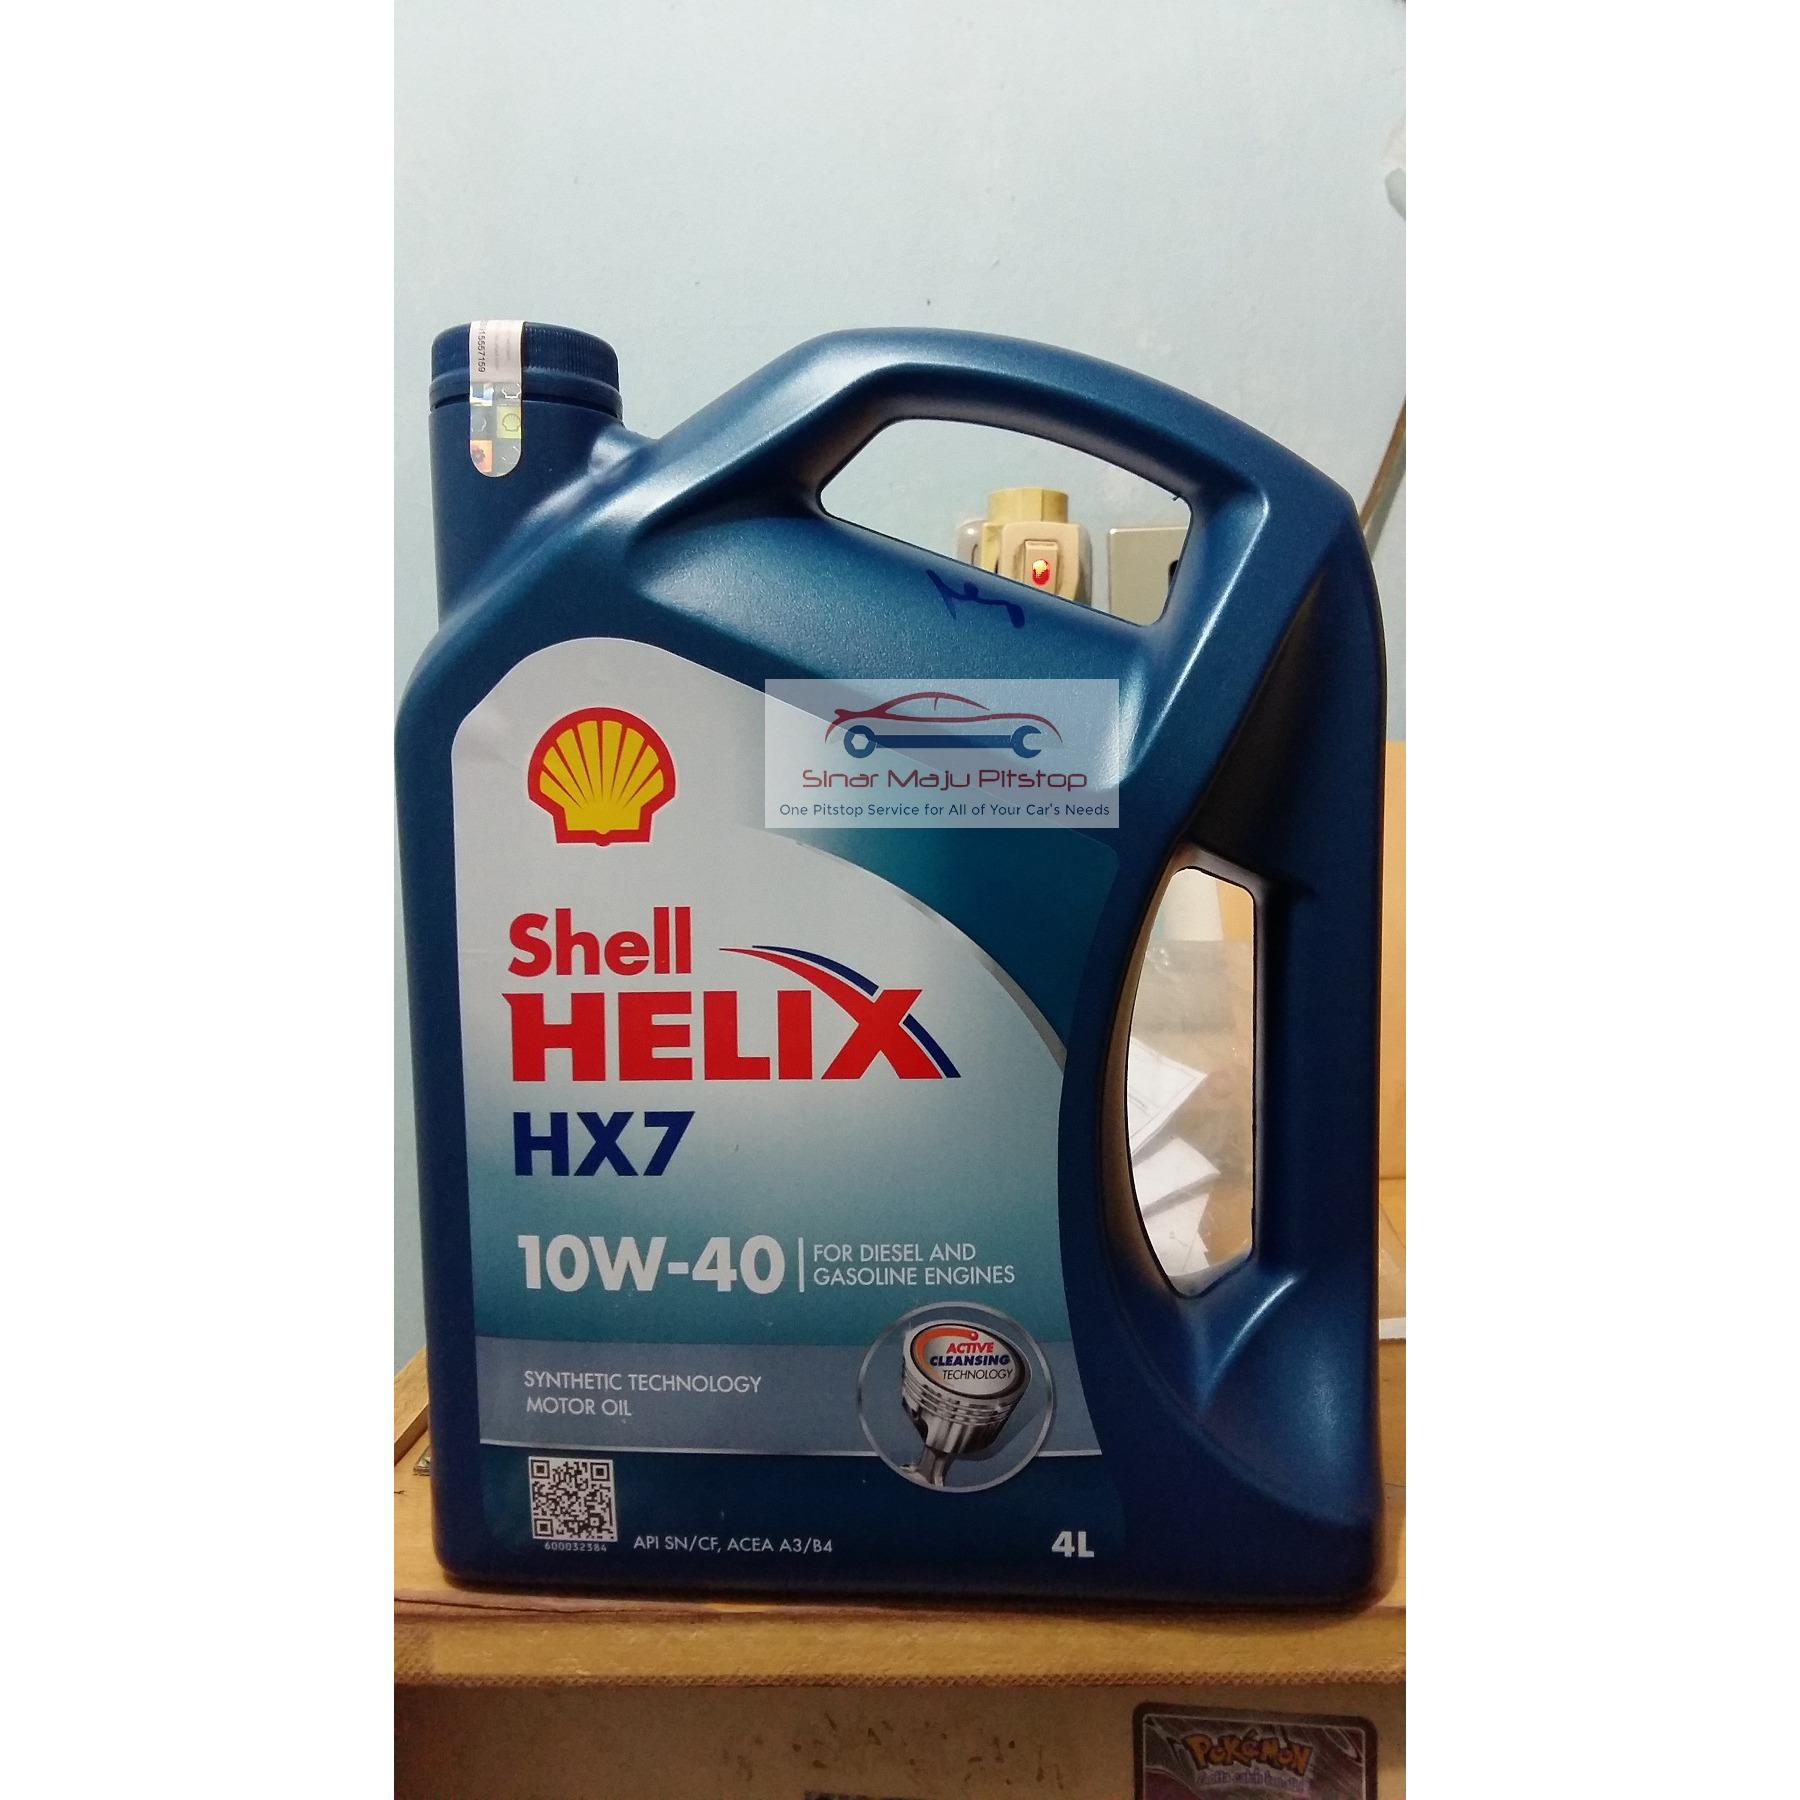 Shell Helix HX7 10W-40 API SN CF- Pelumas Oli Mesin Mobil Kemasan Baru Segel Hologram ORIGINAL BISA DICEK KEASLIAN NYA DI WEBSITE